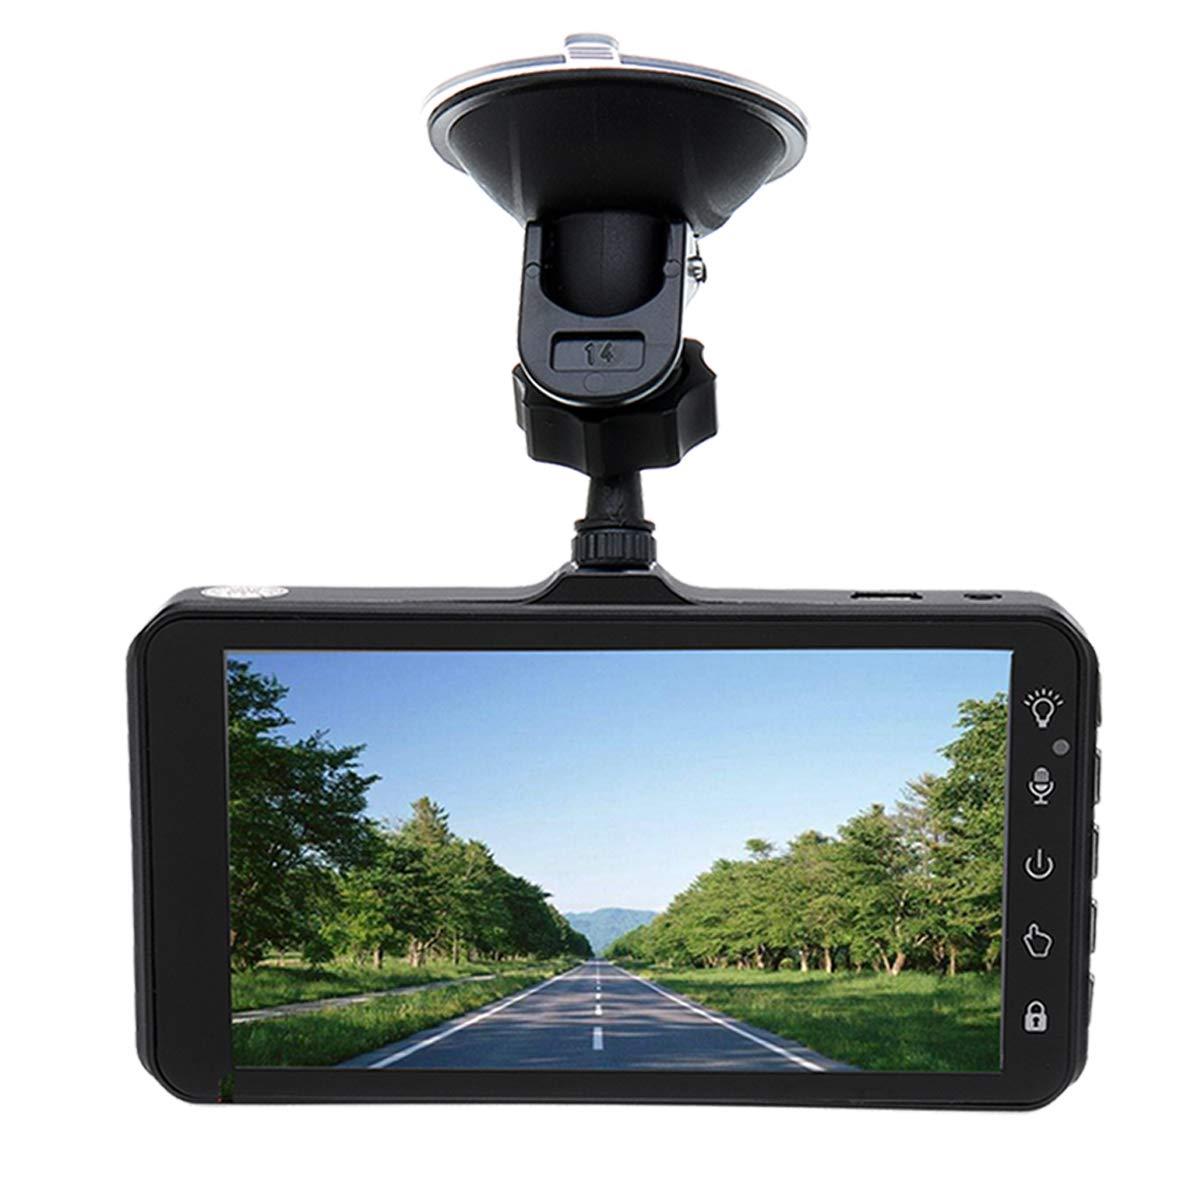 FeLiCia Volles HD 1440P 4 Zoll LCD Touch Screen 1080P Nachsicht-Auto Dvr Für Auto-Fahrzeug